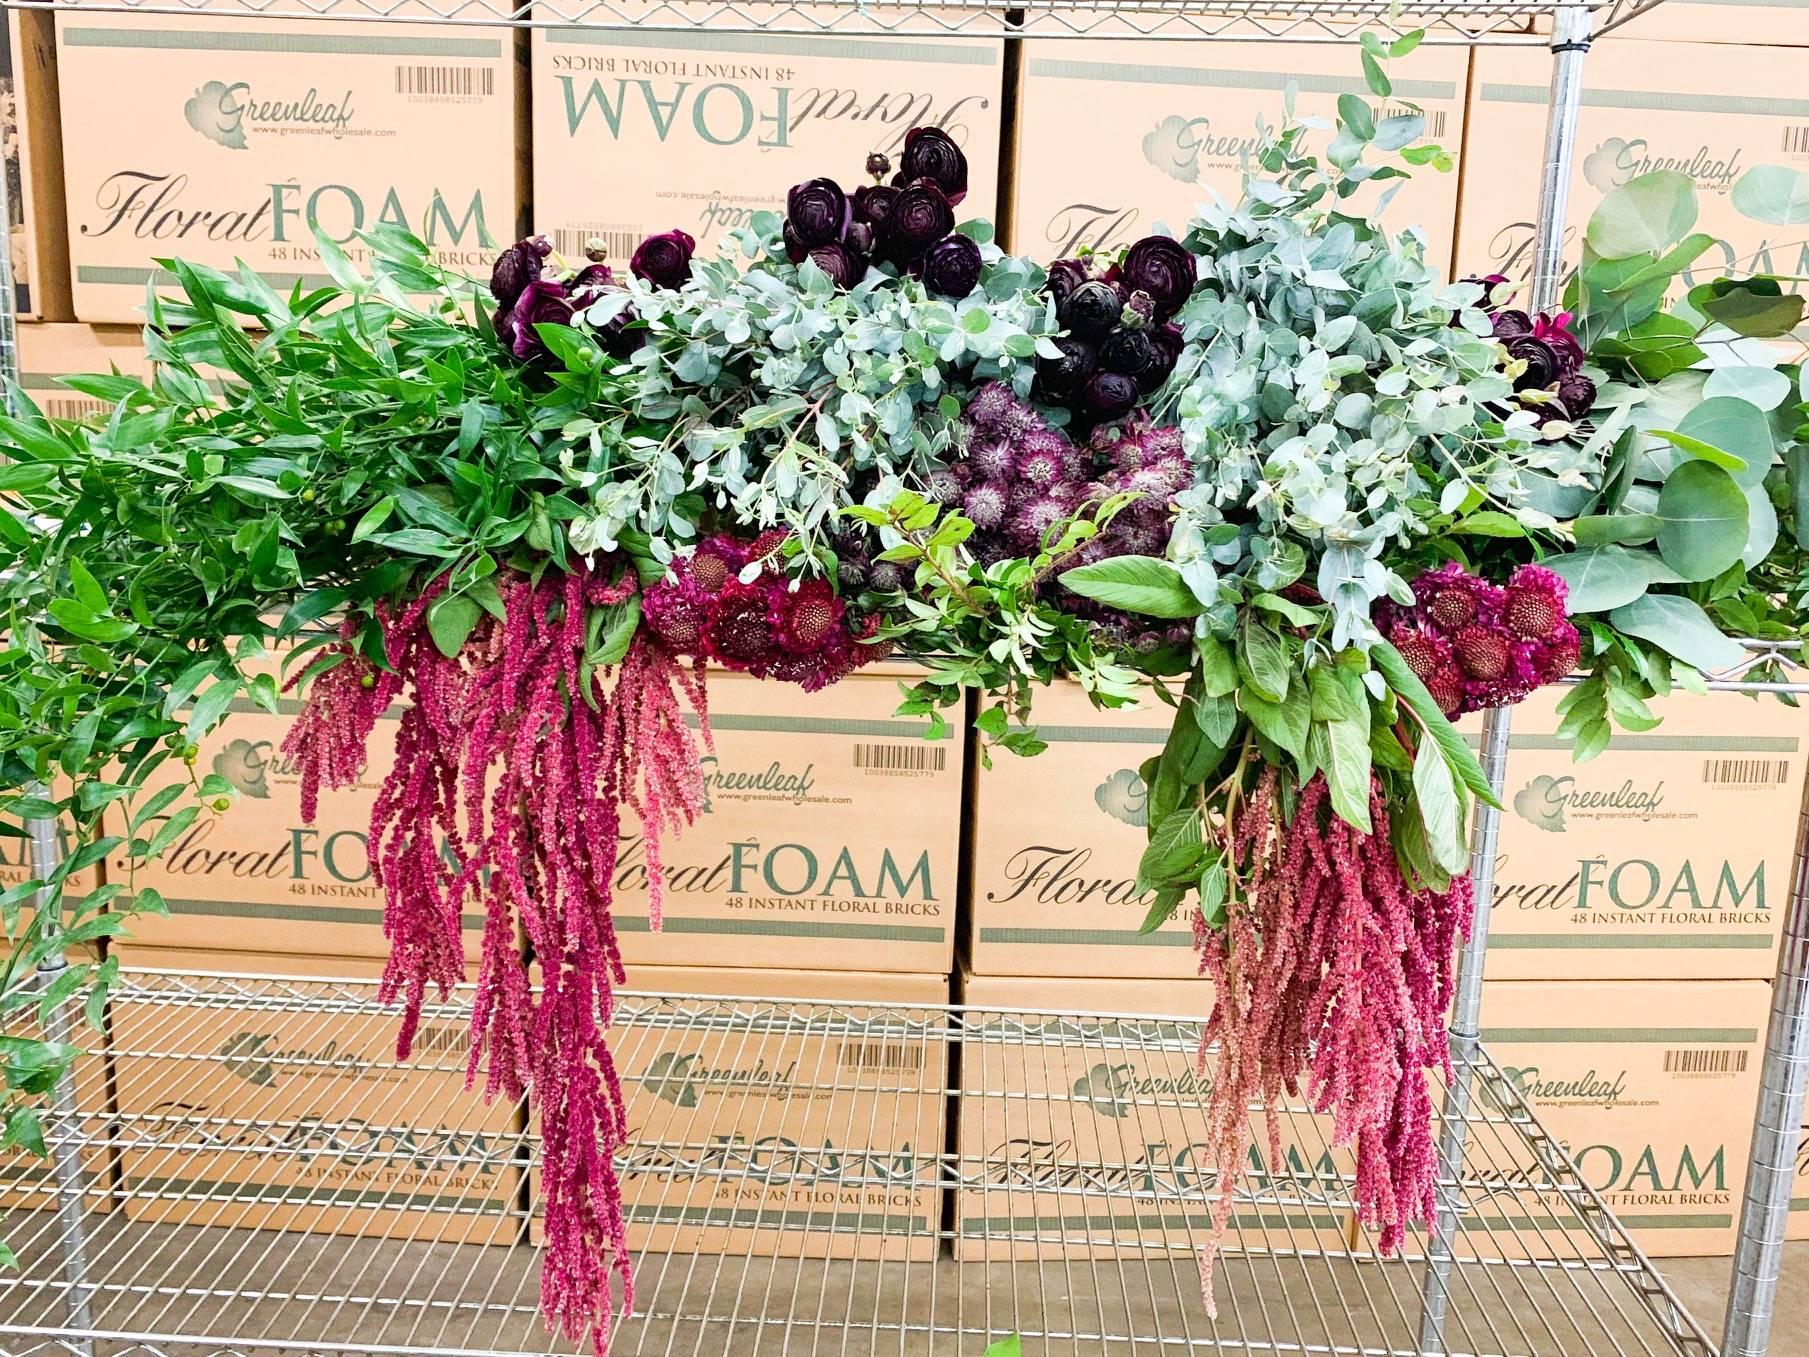 Raspberry scabiosa, purple ranunculus, burg astrantia, eucalyptus, hanging amaranthus